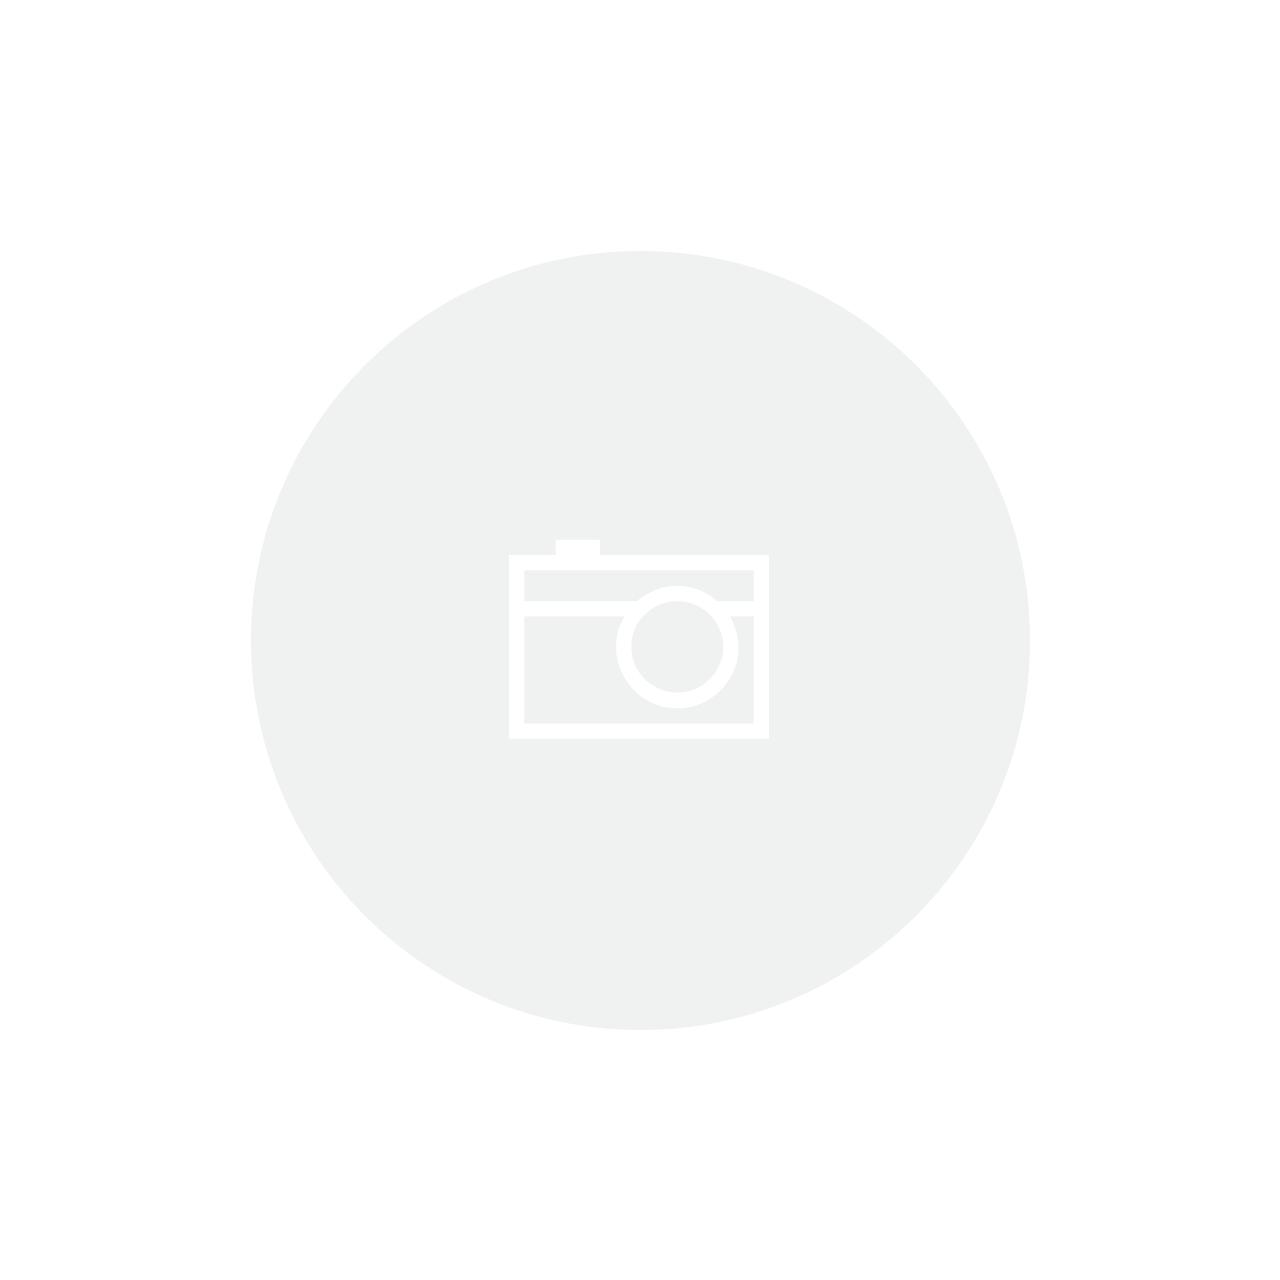 Abajur de Murano Preto com Base Inox